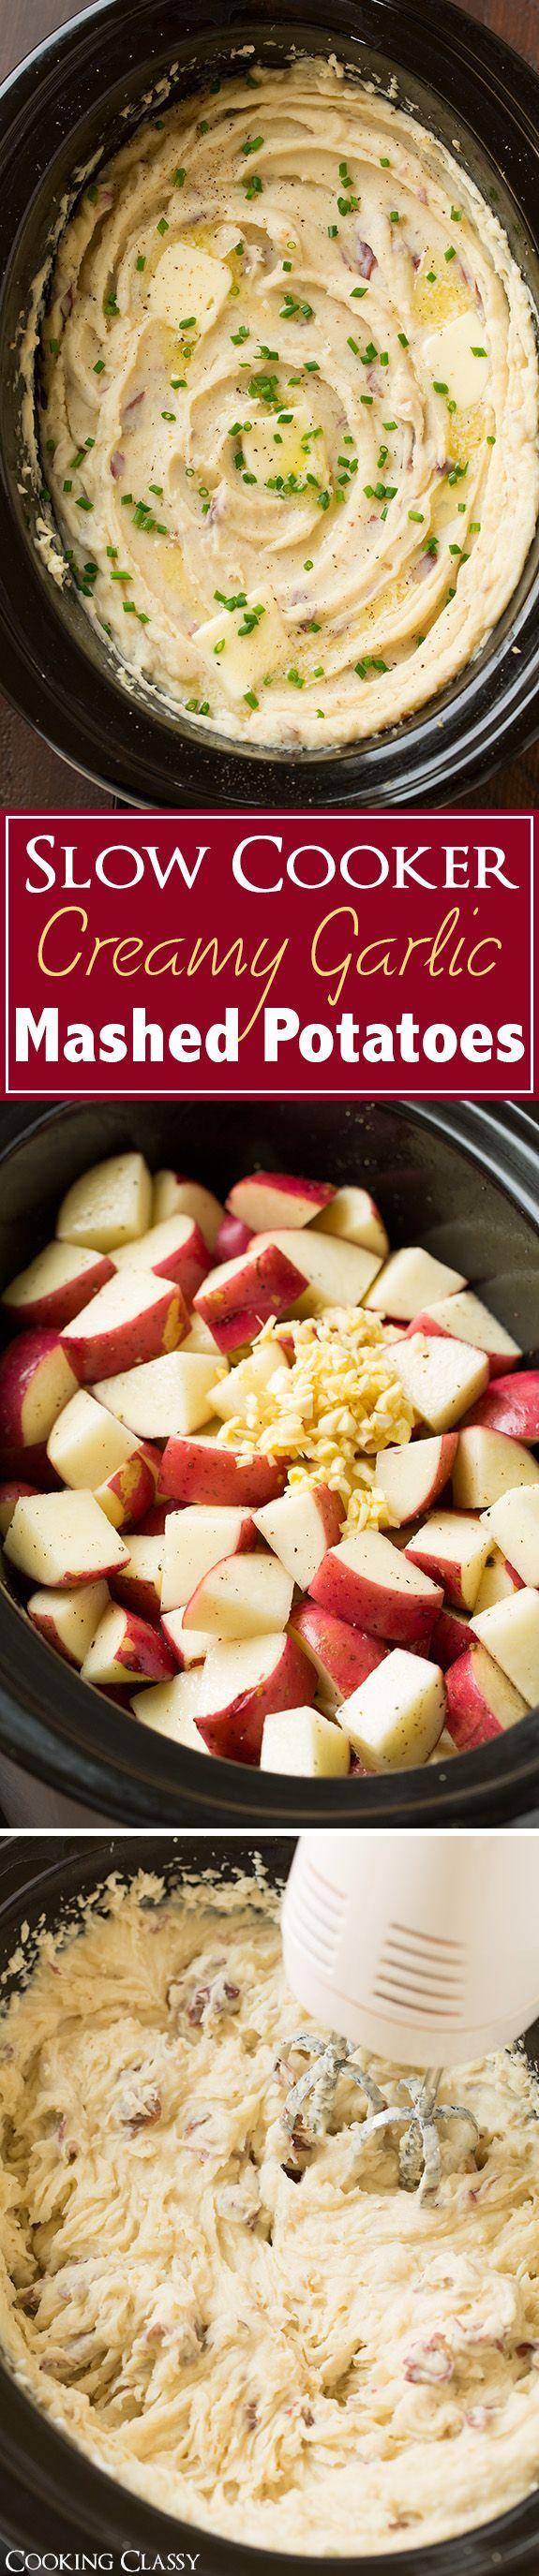 Slow Cooker Creamy Garlic Mashed Potatoes - So easy to make, so creamy, so delicious!